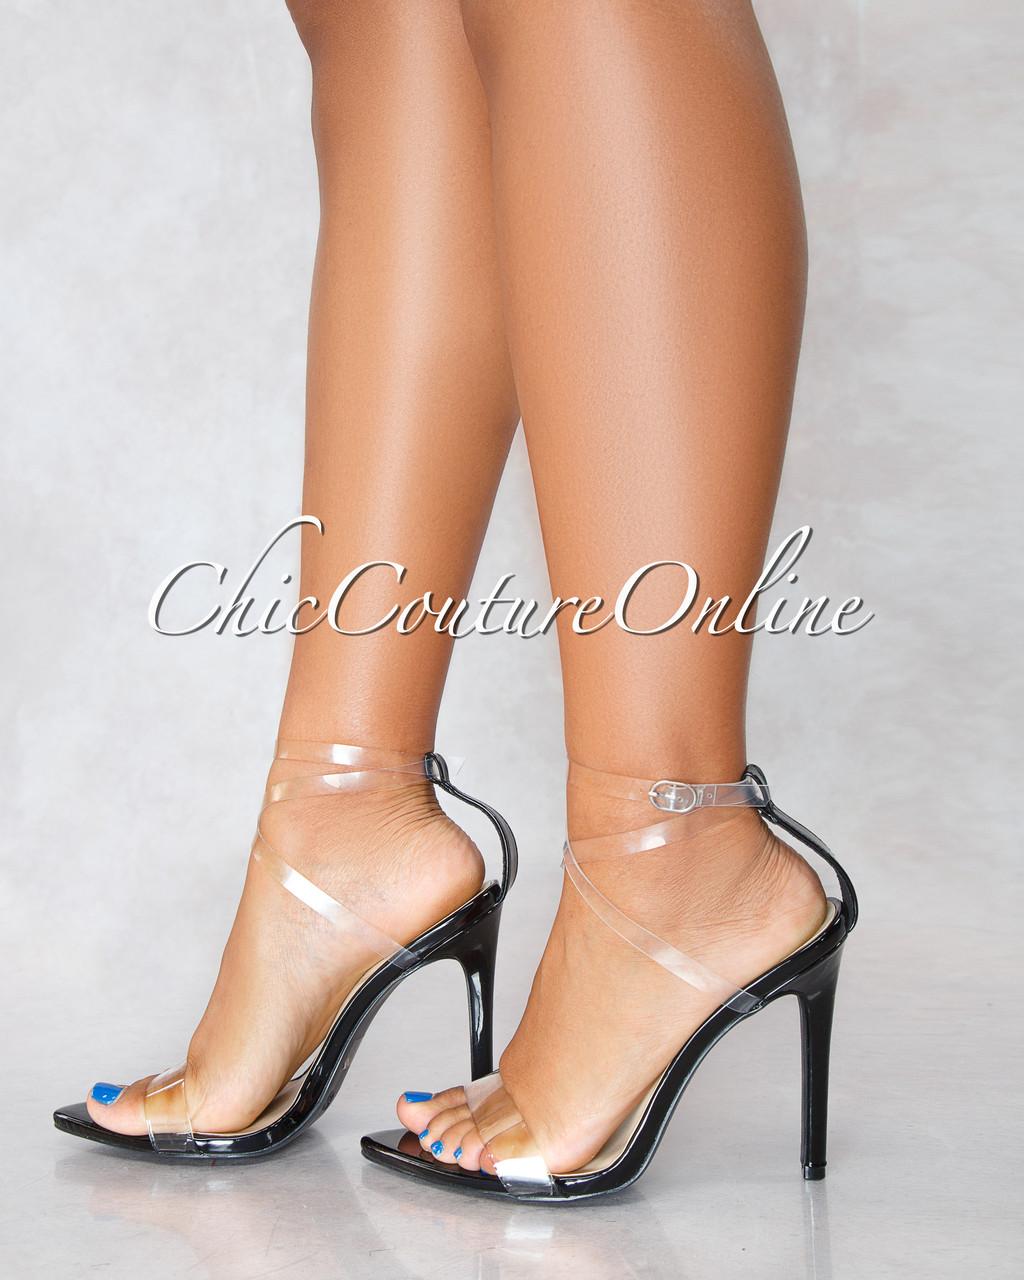 05544ec6d0 ... Clear Strap High Heels. Image 1. Loading zoom